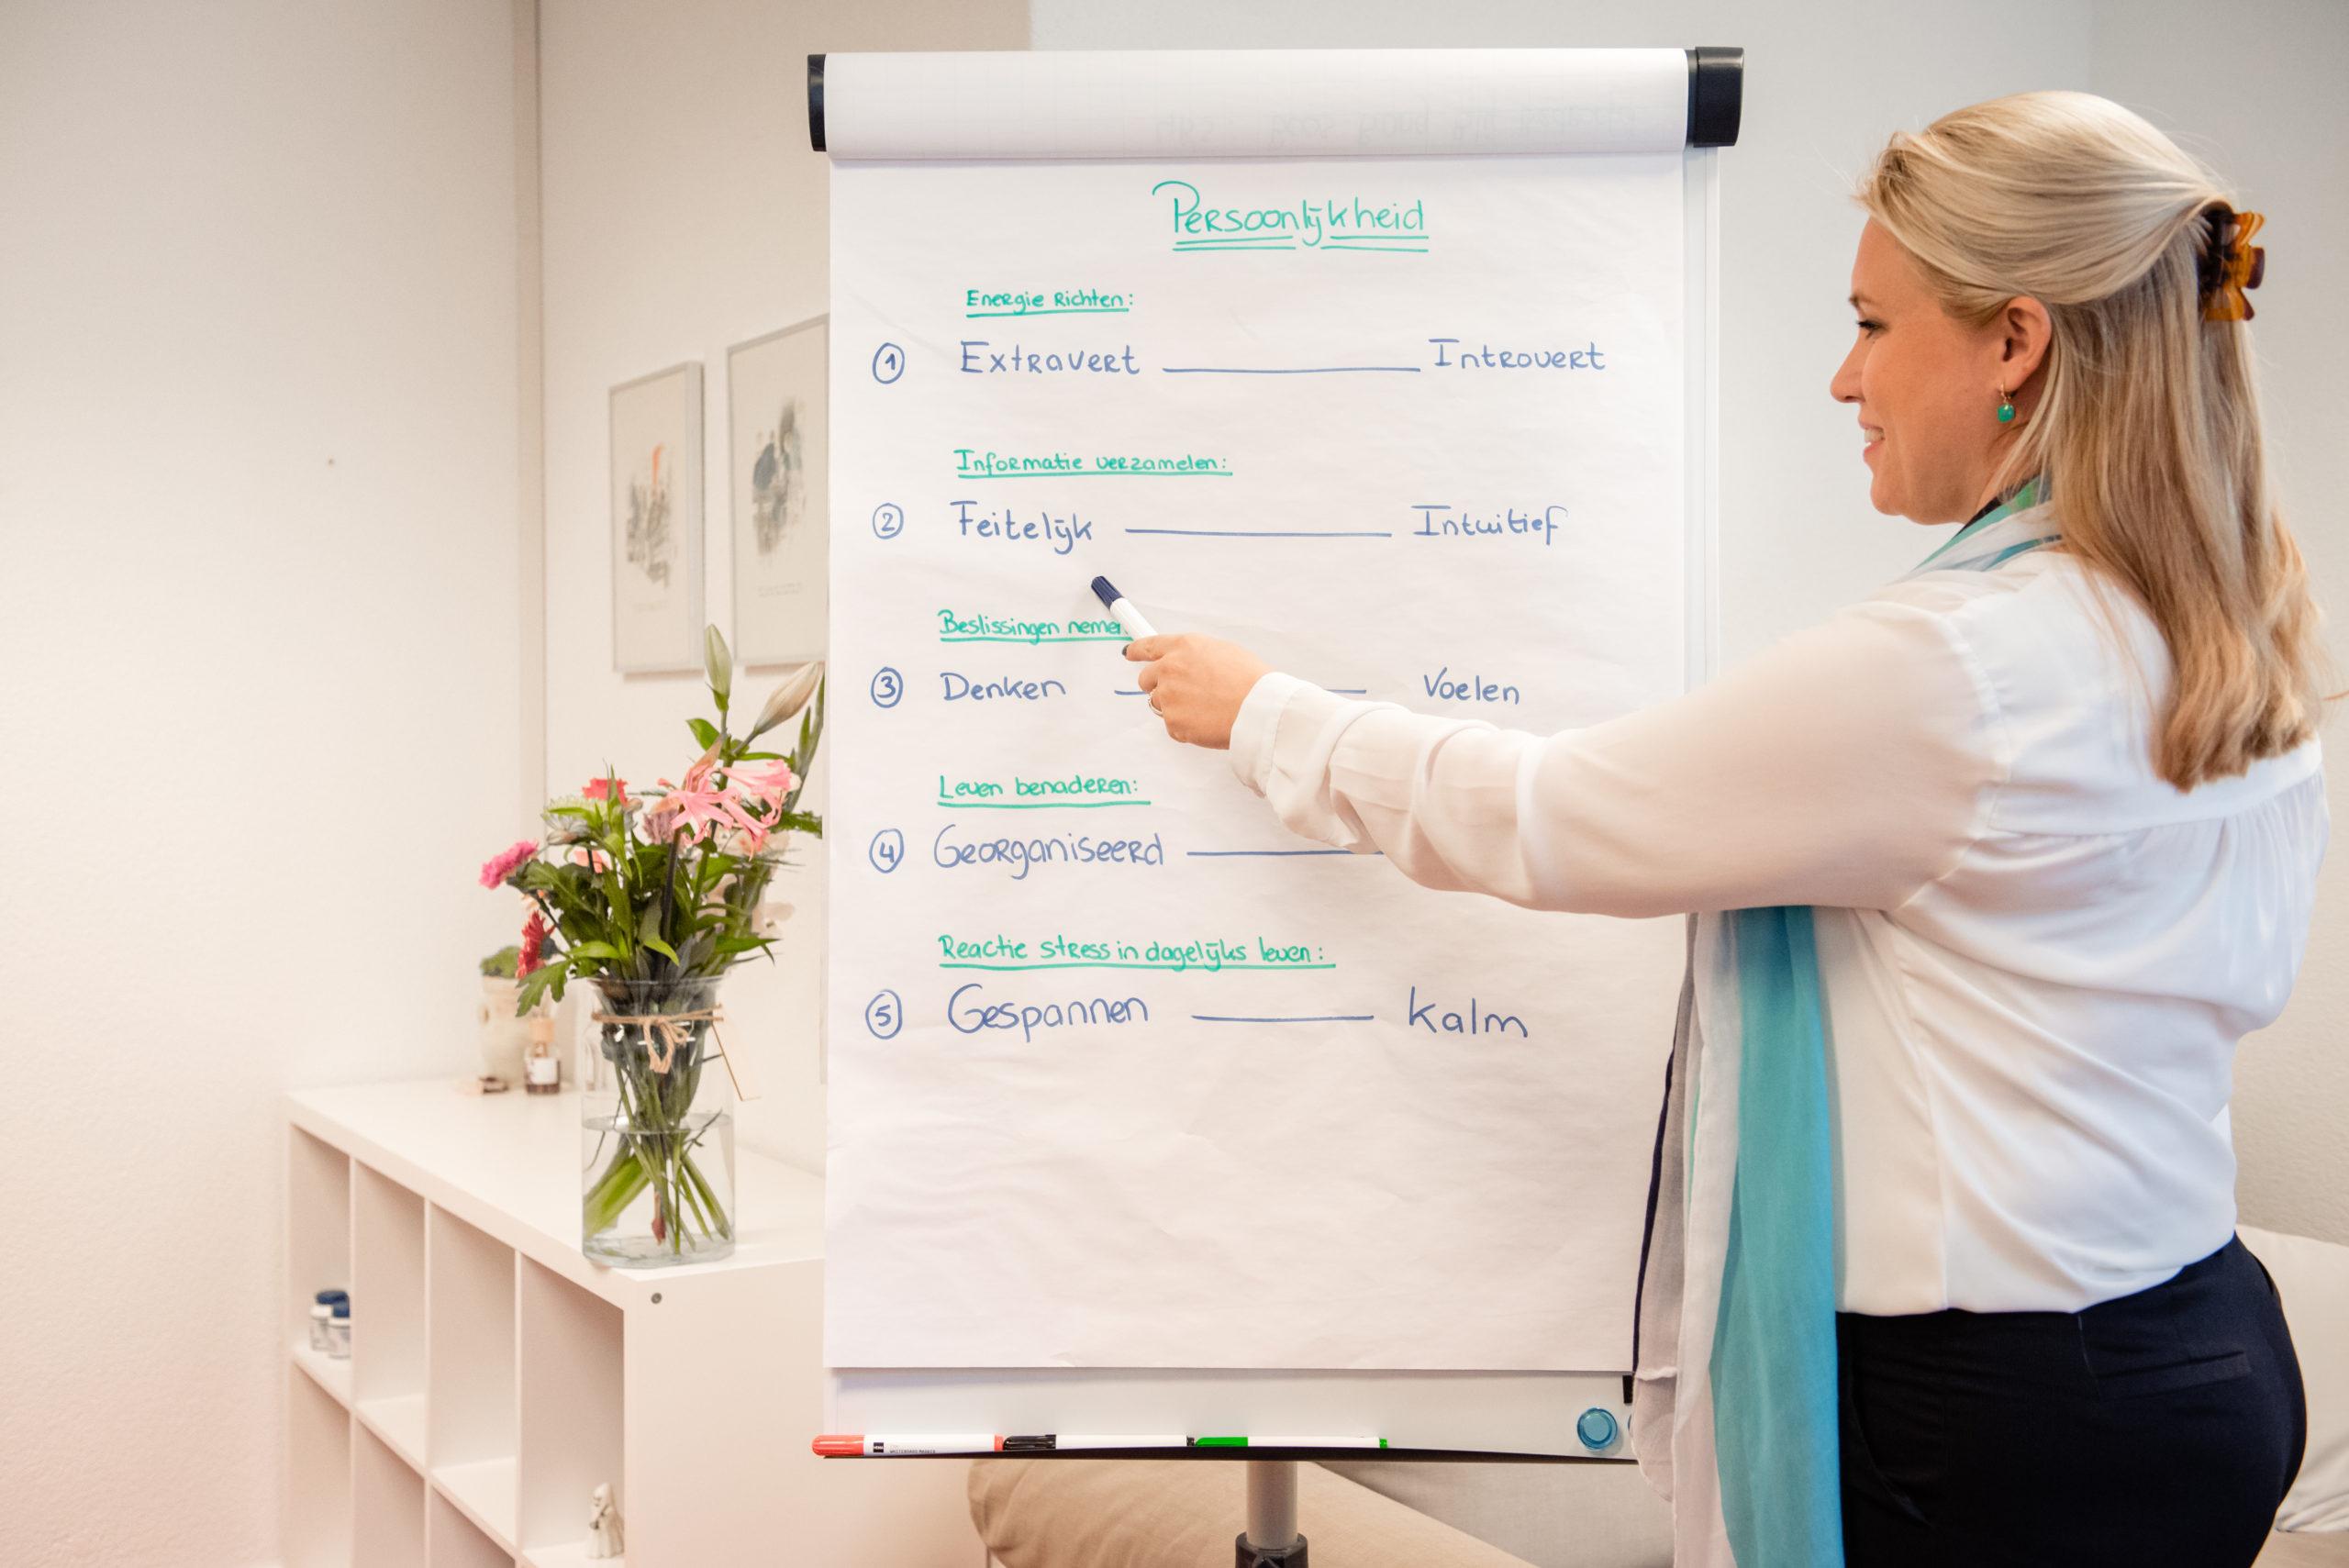 workshop of training geven